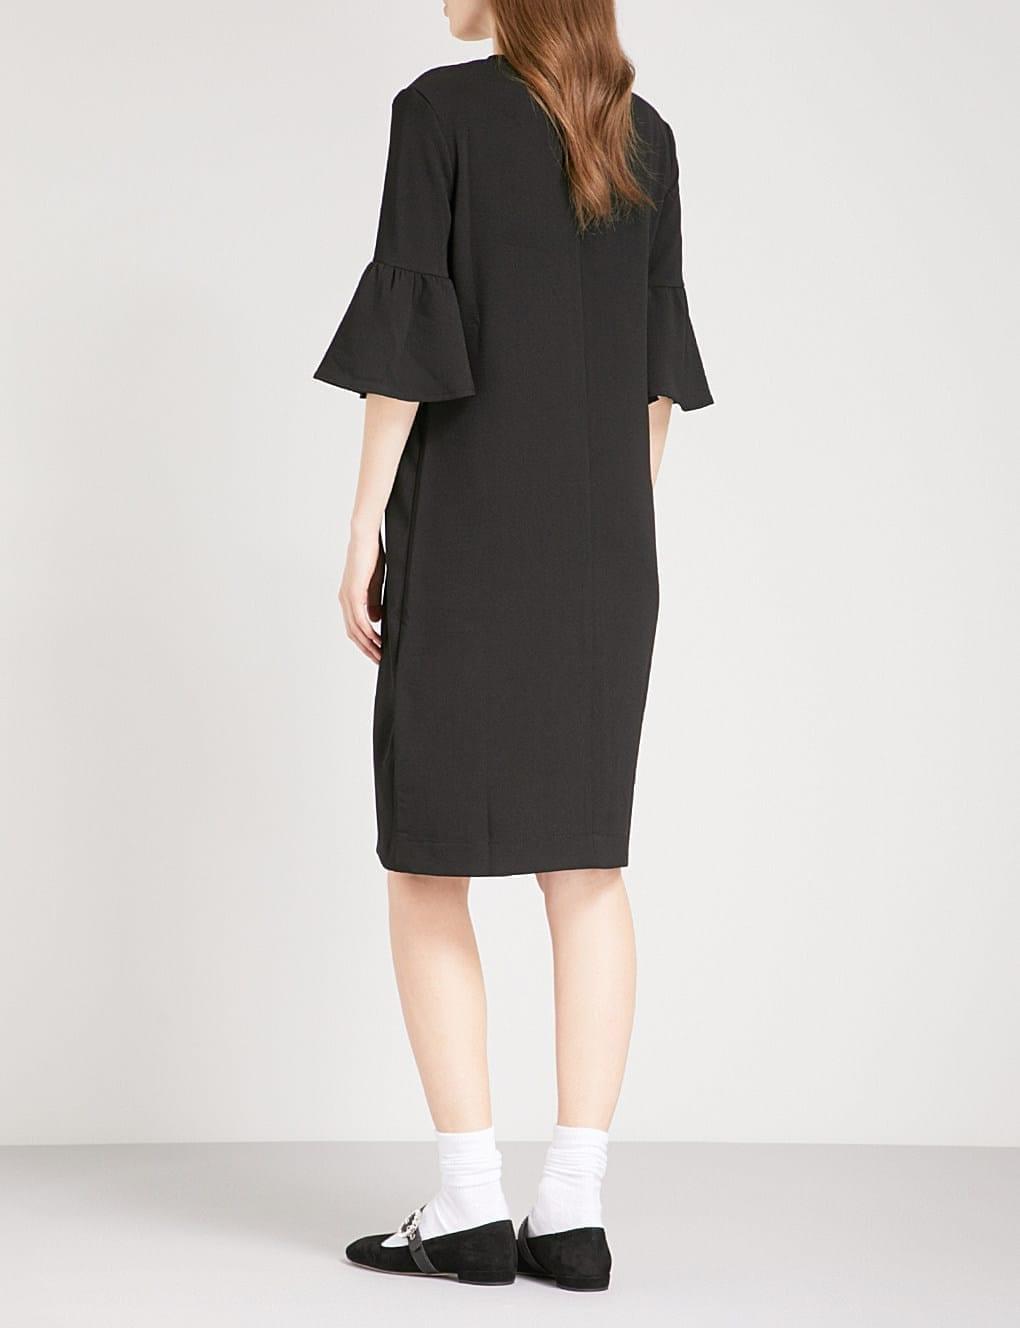 50b304ac8237f GANNI Clark Fluted Crepe Black Dress - We Select Dresses